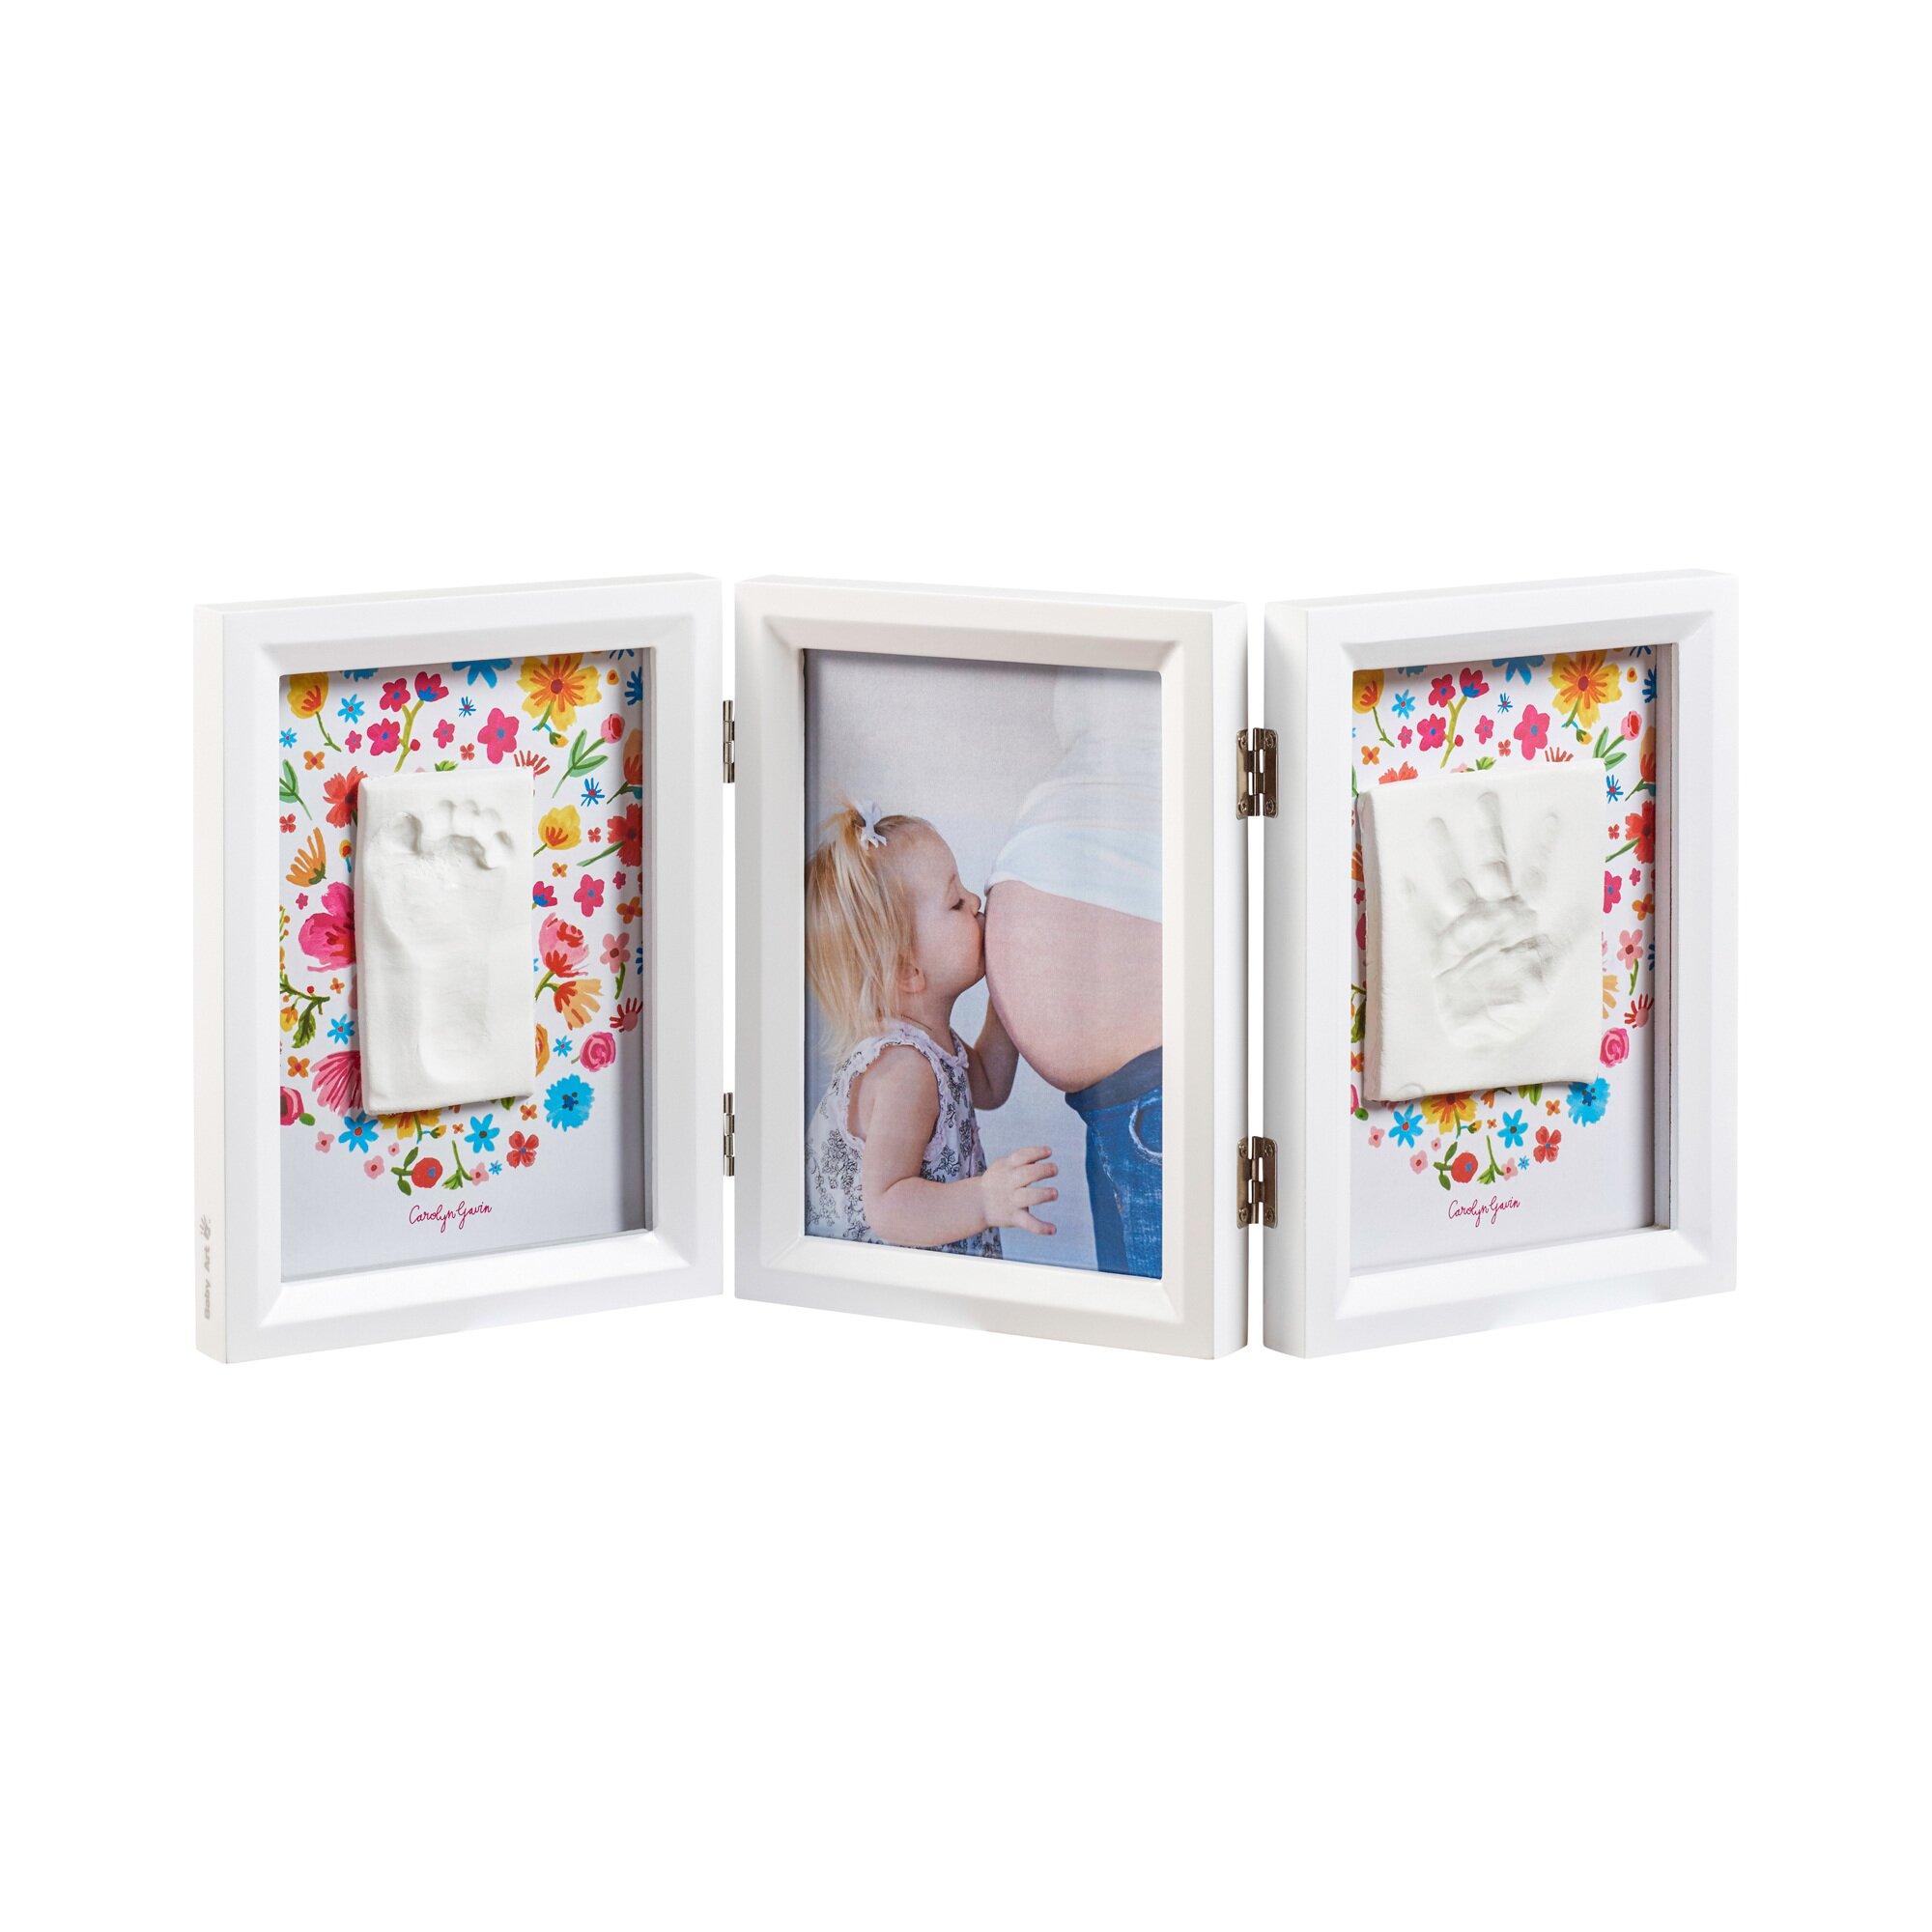 baby-art-bastelset-3er-bilderrahmen-my-baby-touch-by-carolyn-gavin